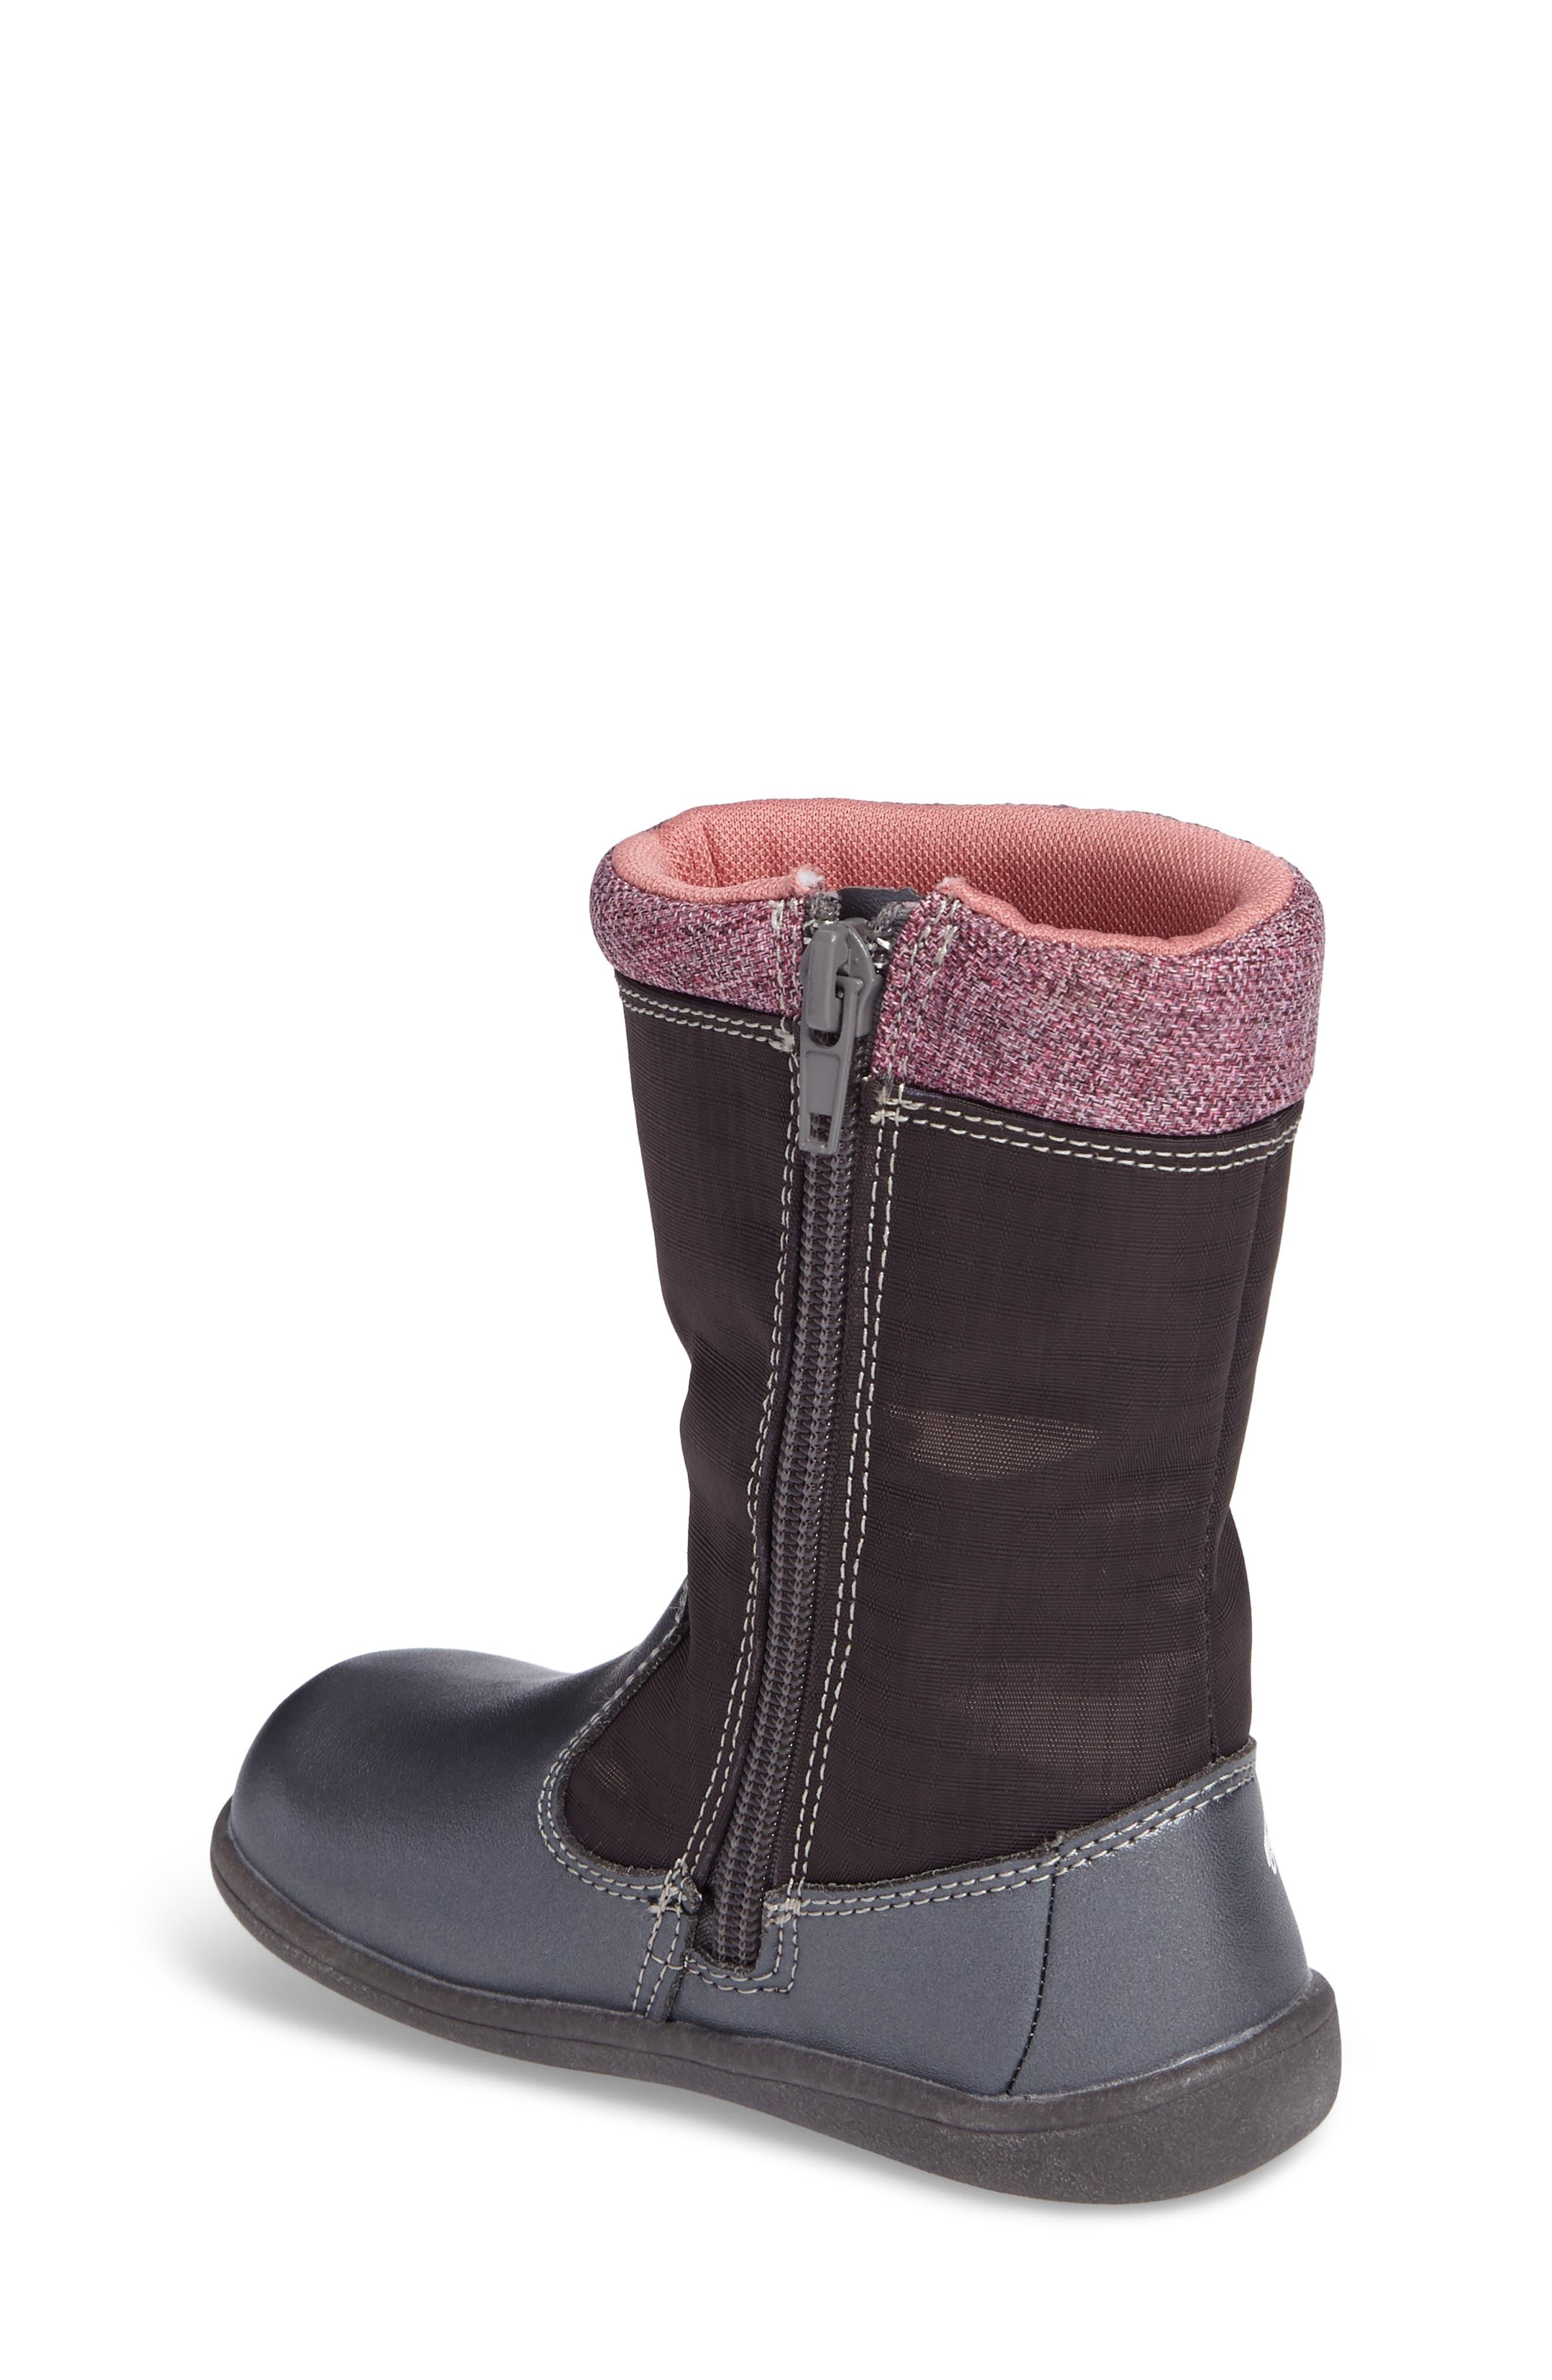 'Hallie' Waterproof Boot,                             Alternate thumbnail 2, color,                             021